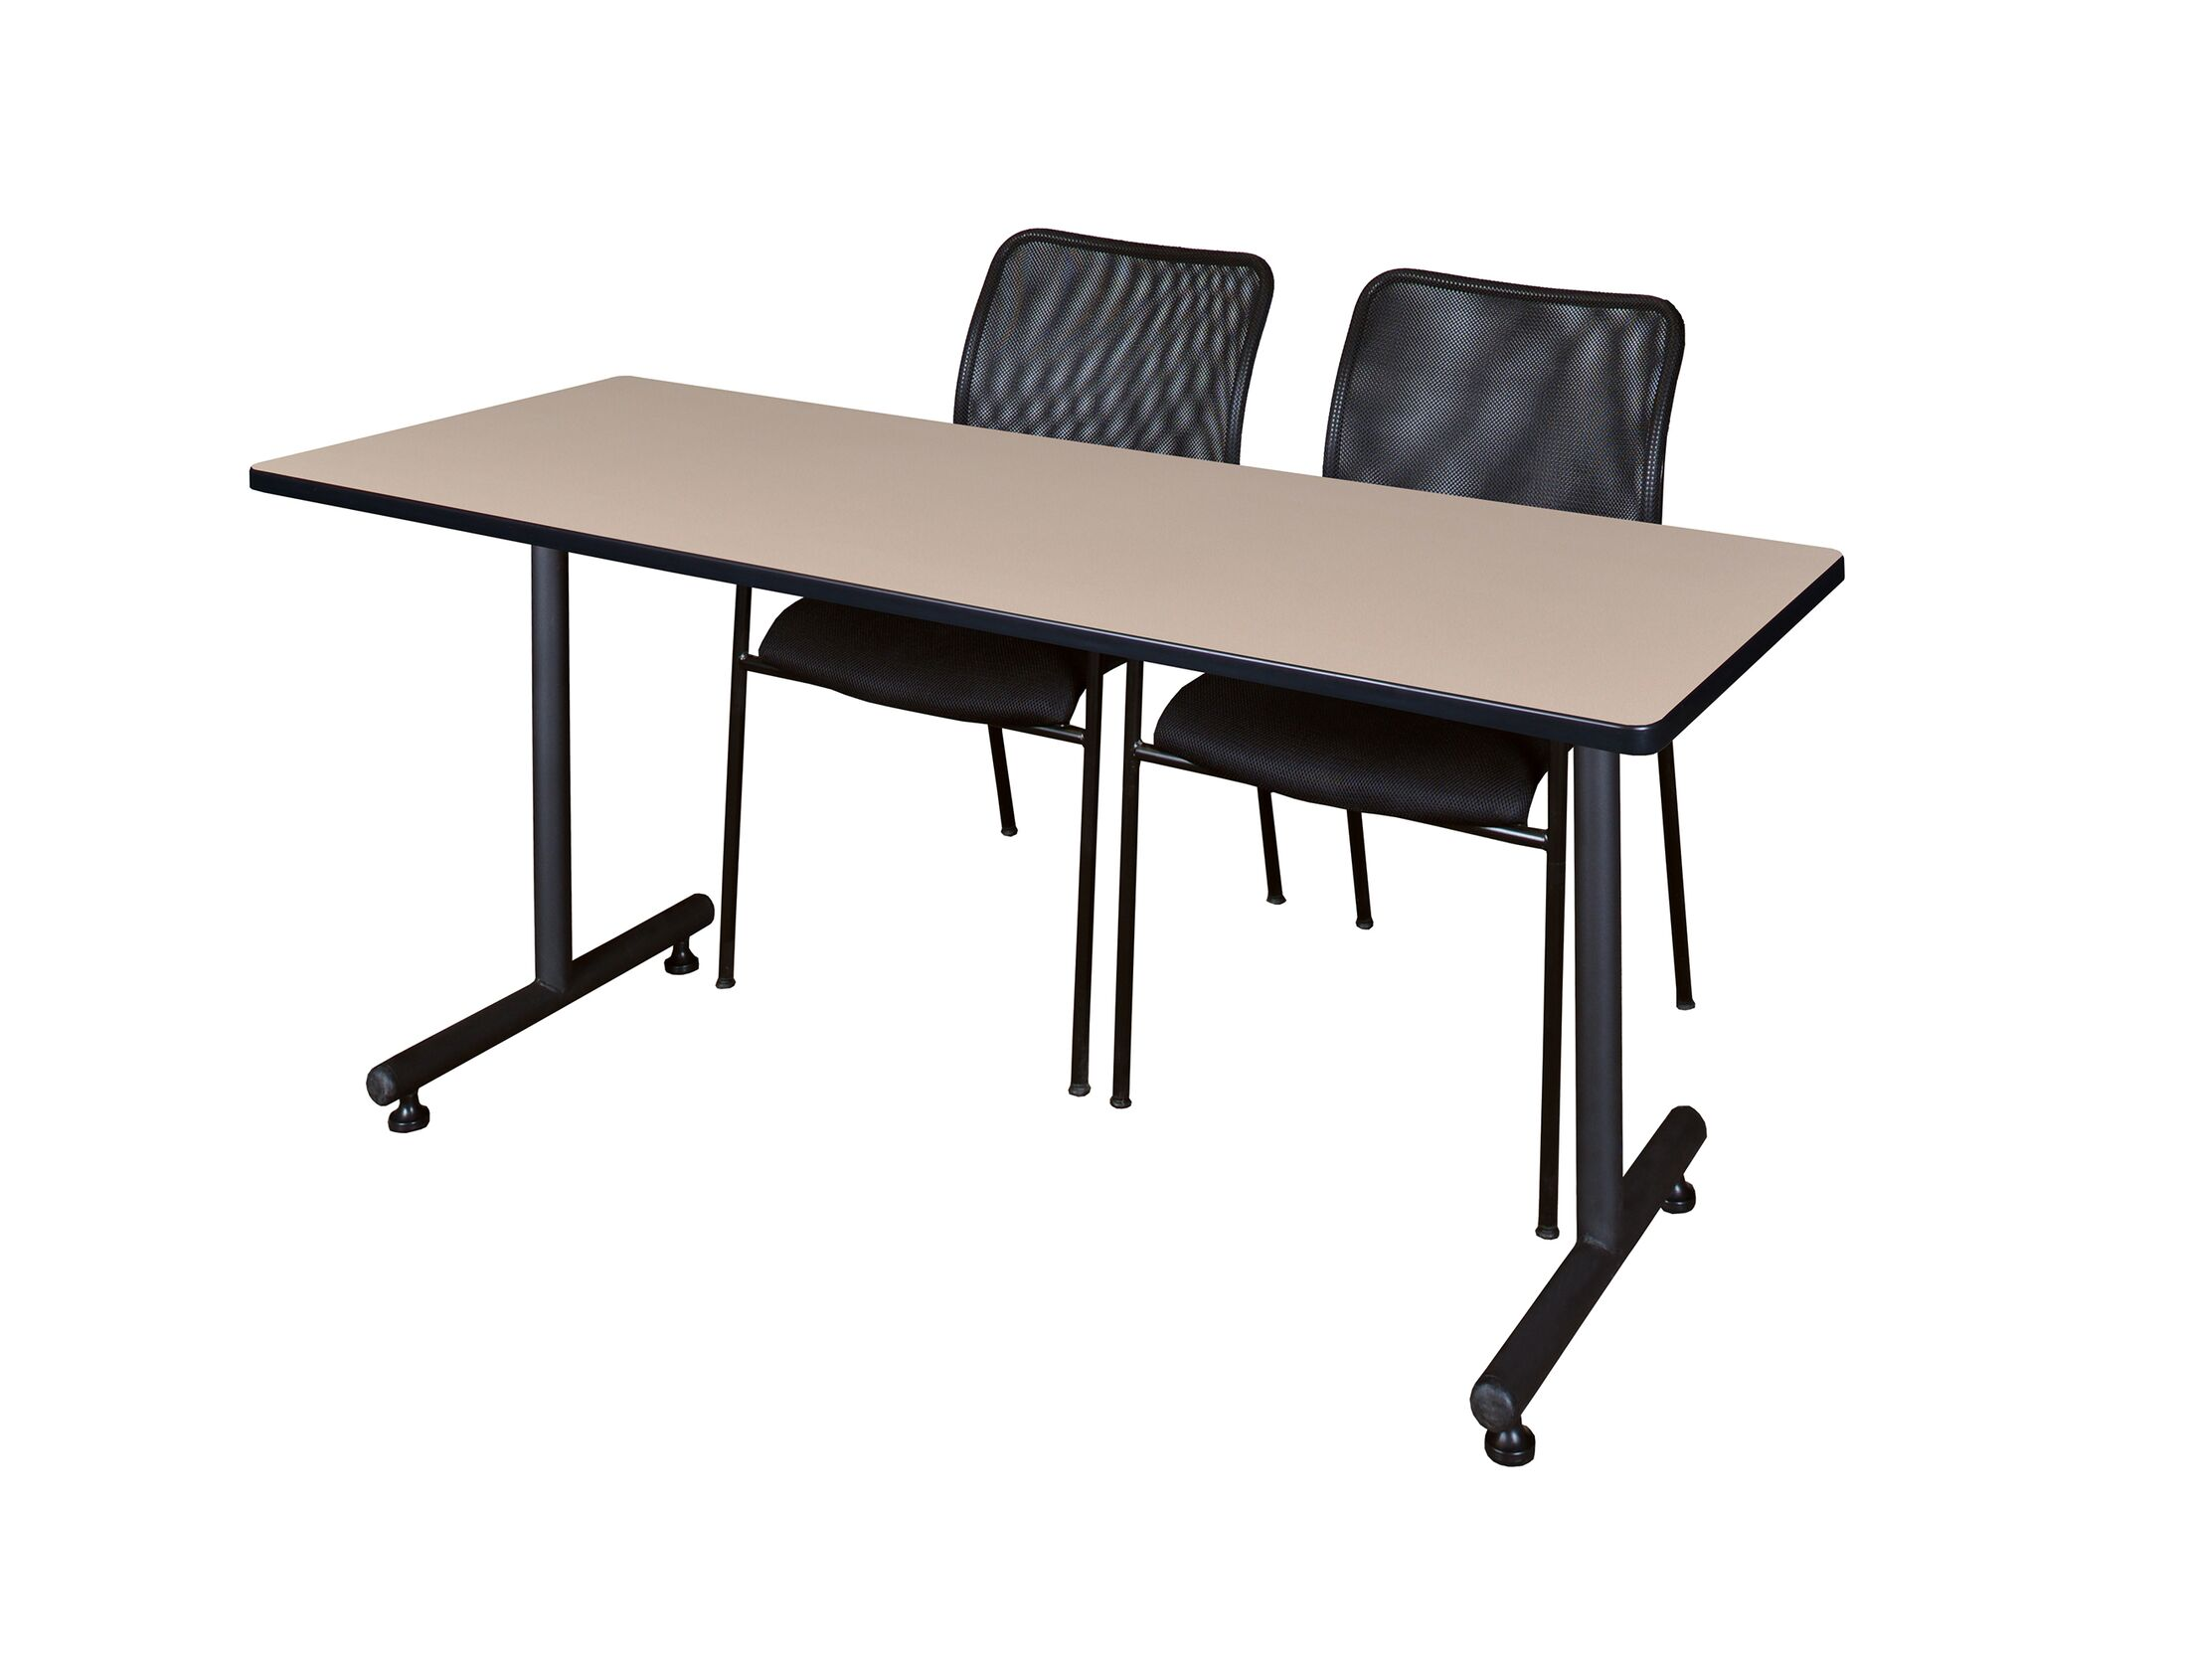 Marin Training Table with Wheels Tabletop Finish: Mocha Walnut, Size: 29